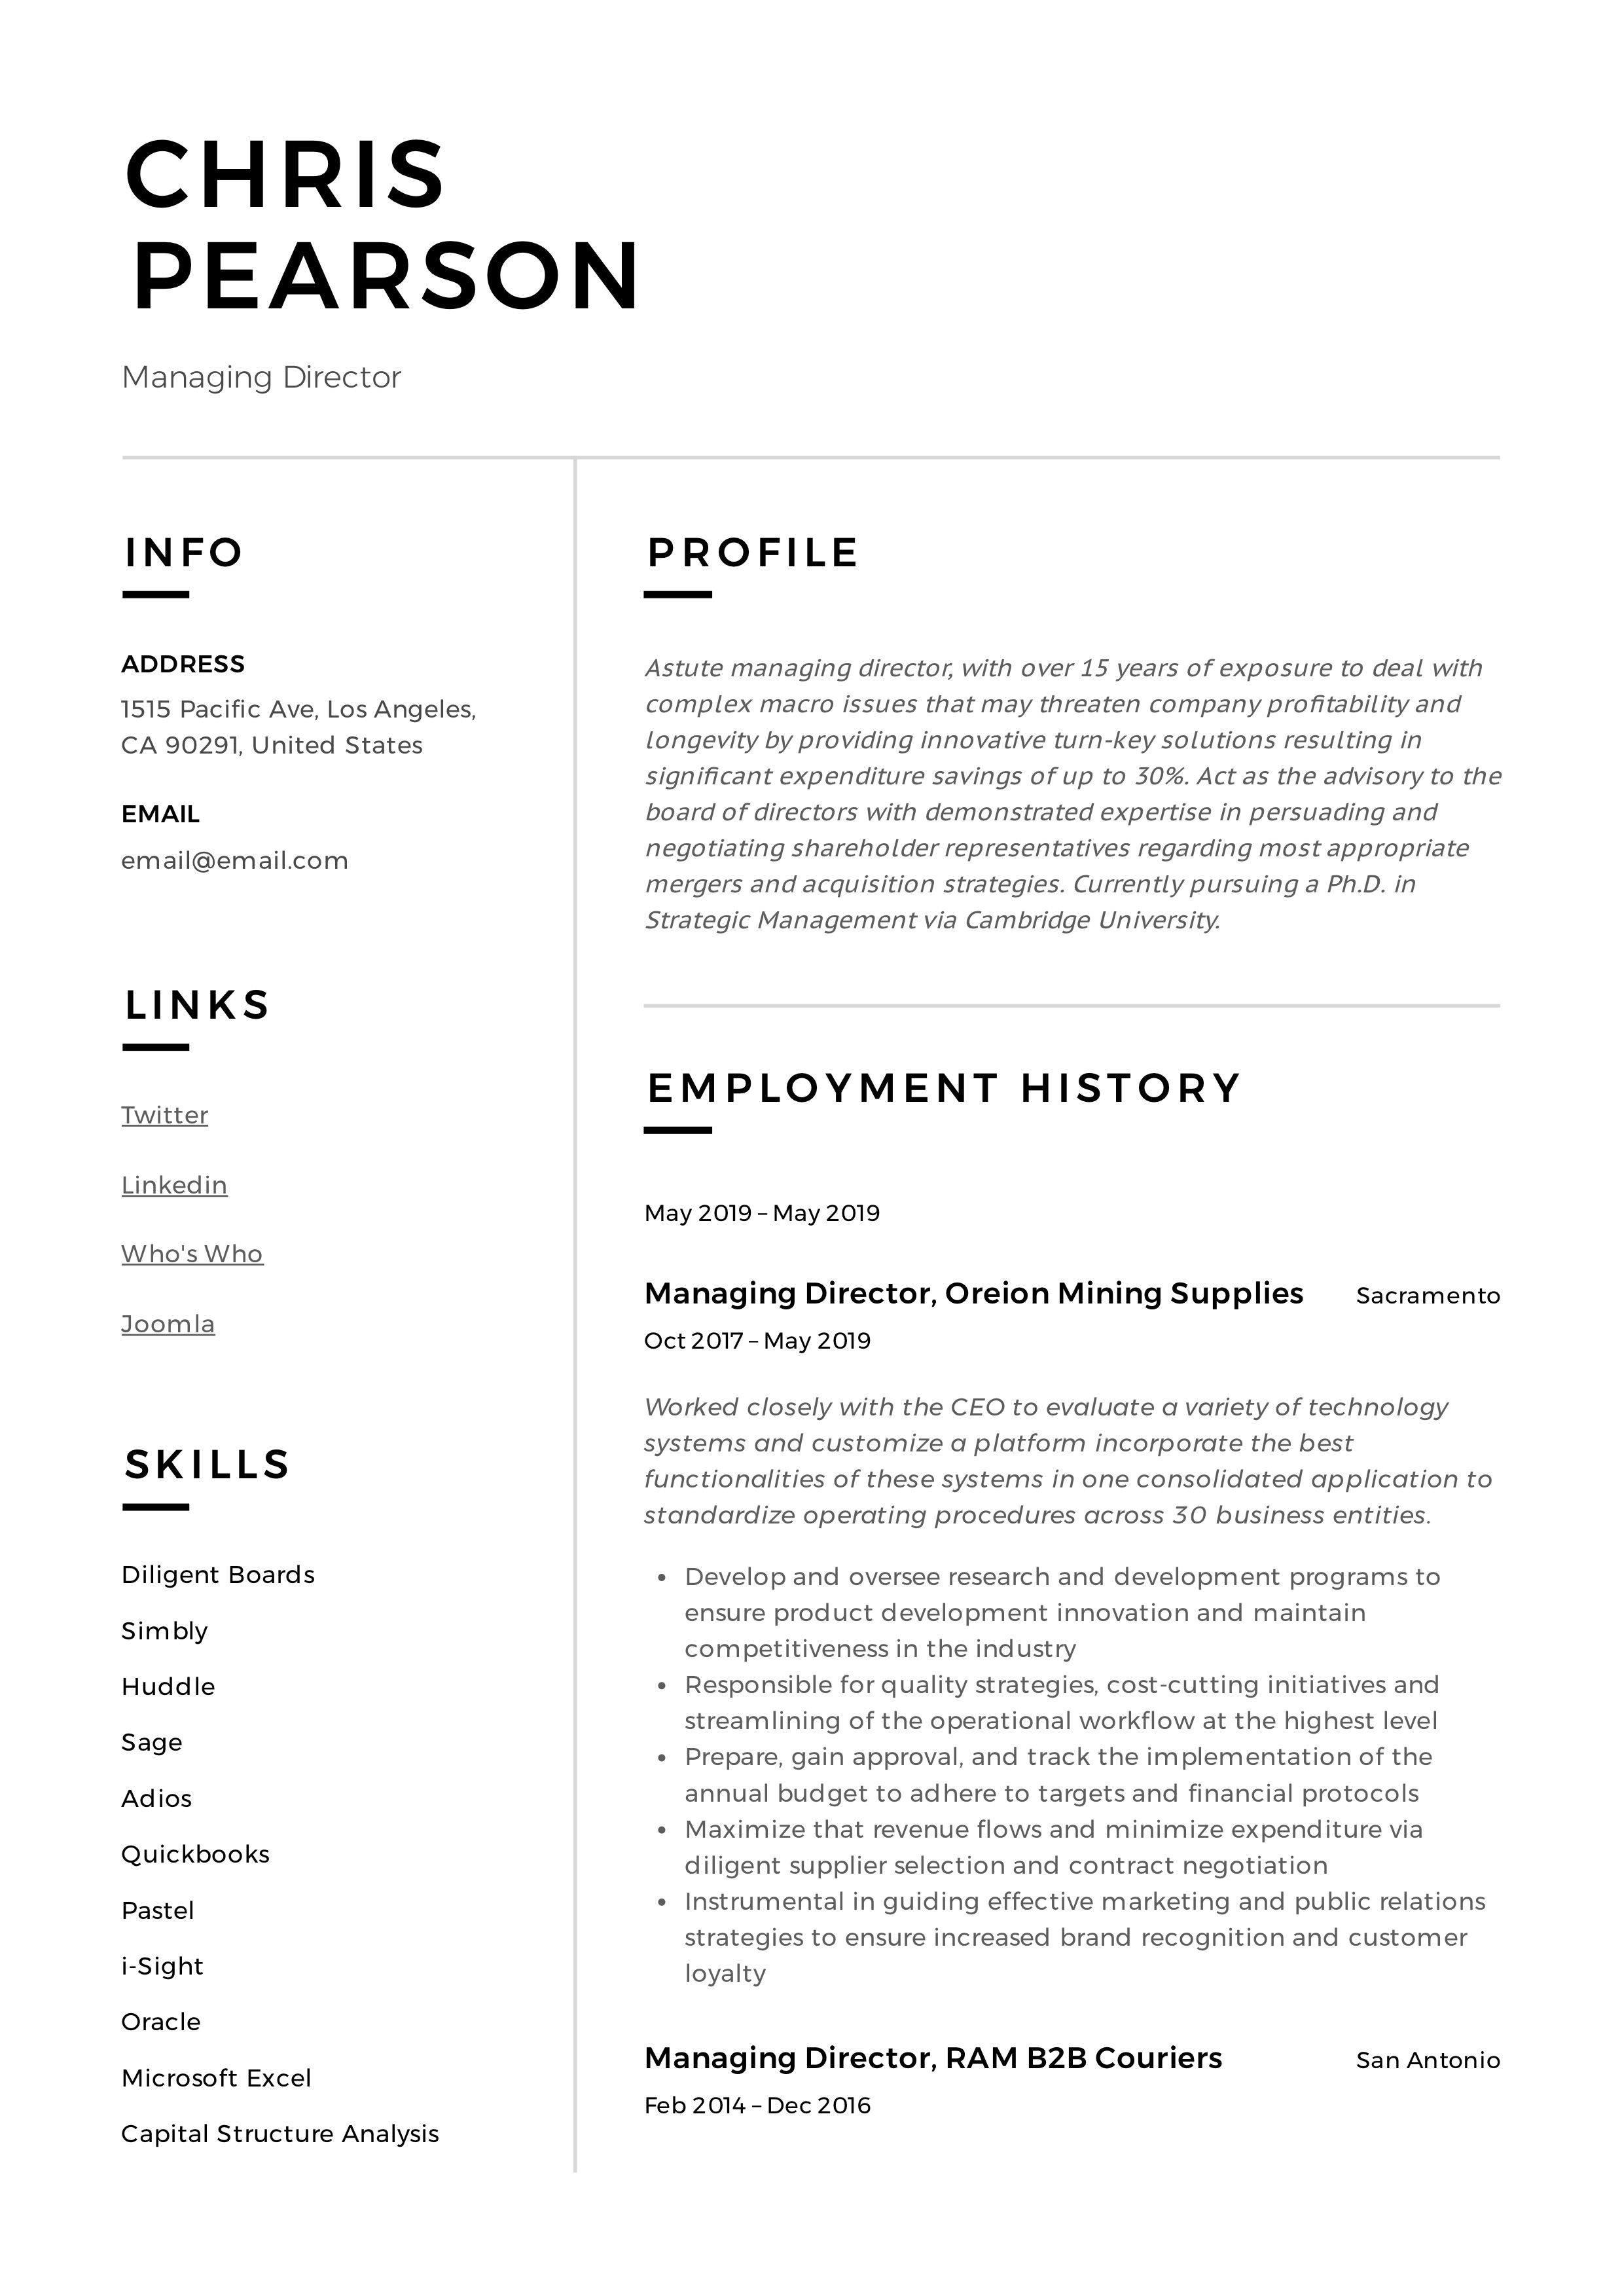 Managing Director Resume Sample Guided Writing Resume Writing Resume Guide